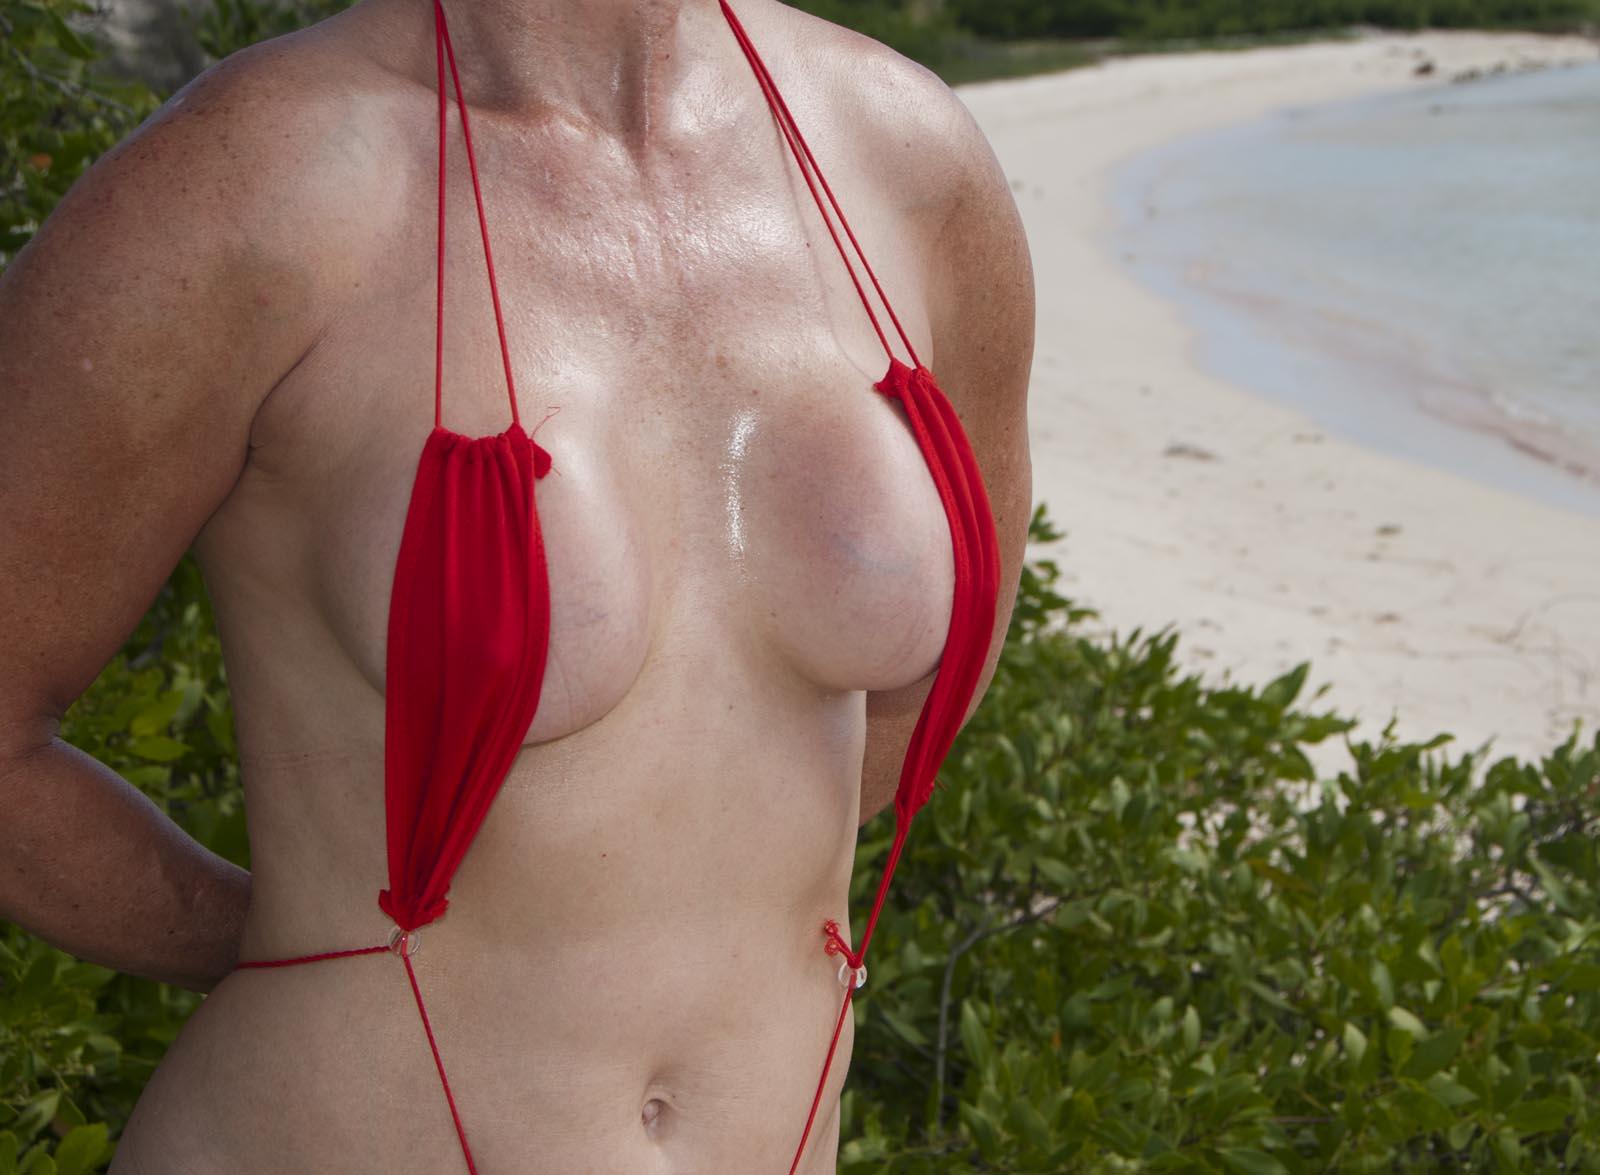 bikini micro mini slingshot thong topless